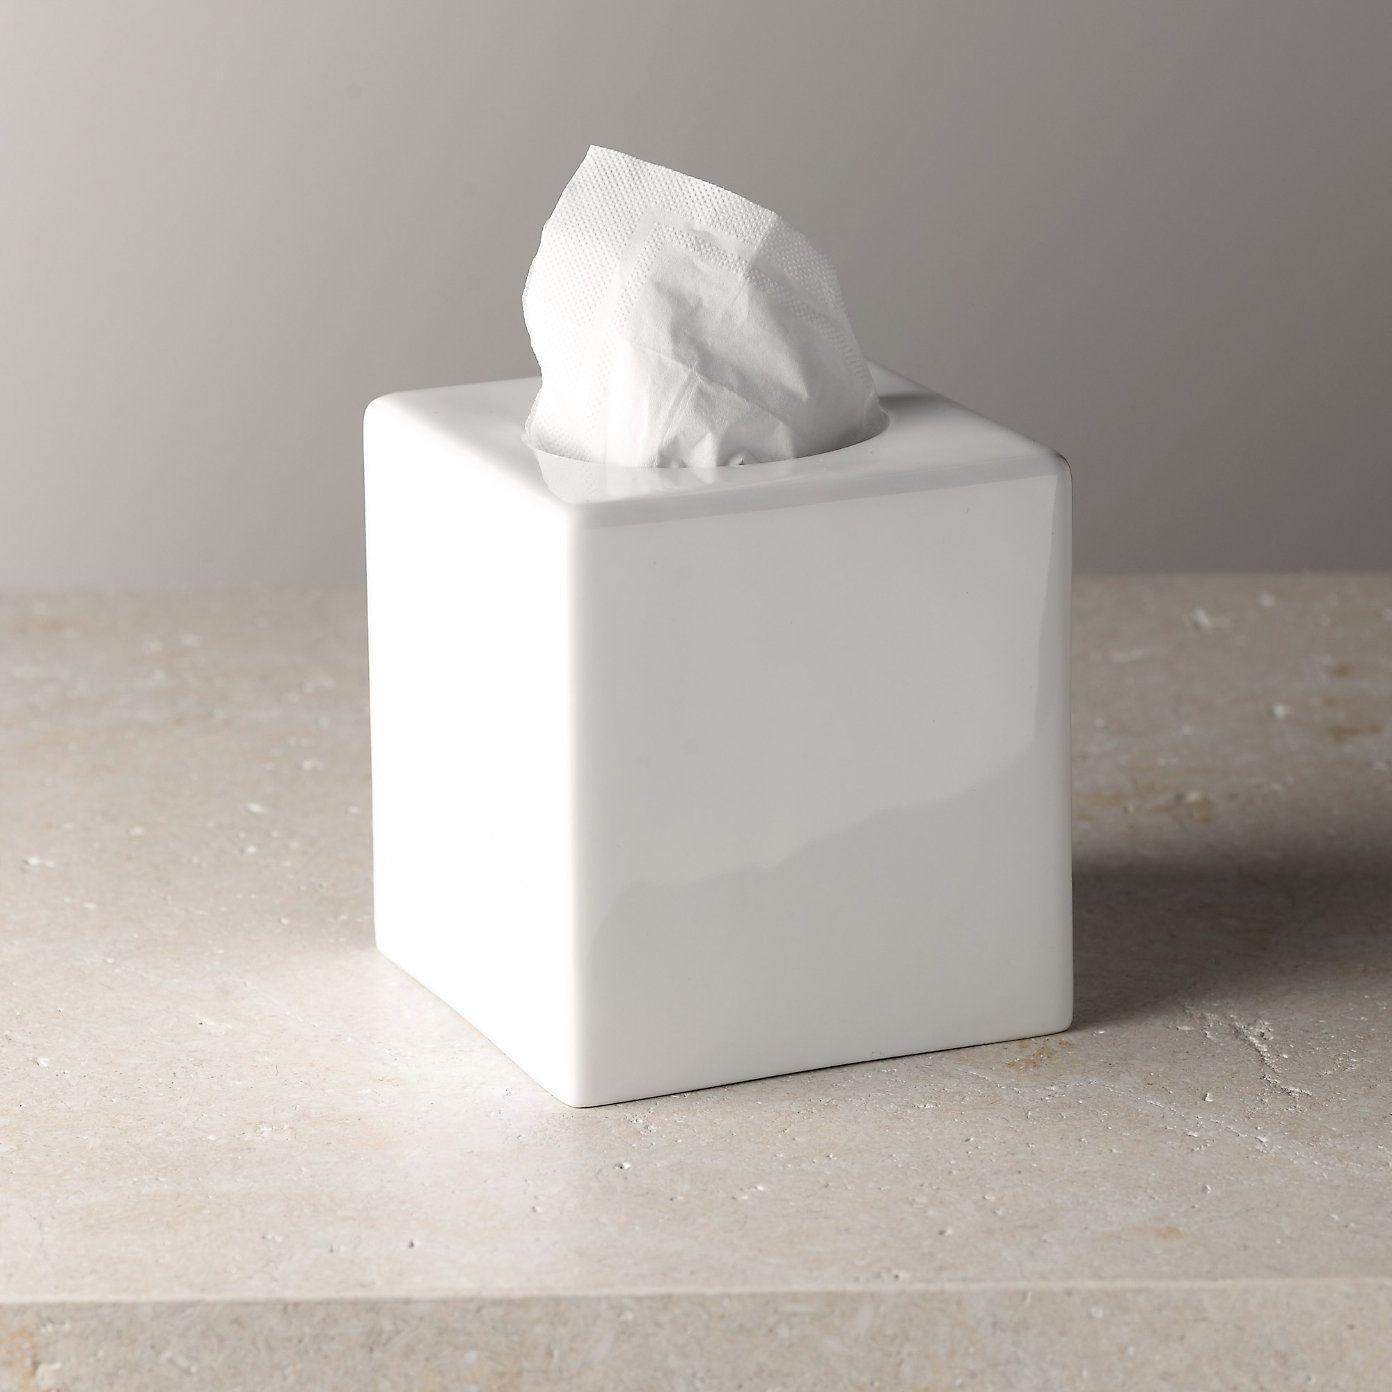 Ceramic Tissue Box Cover The White